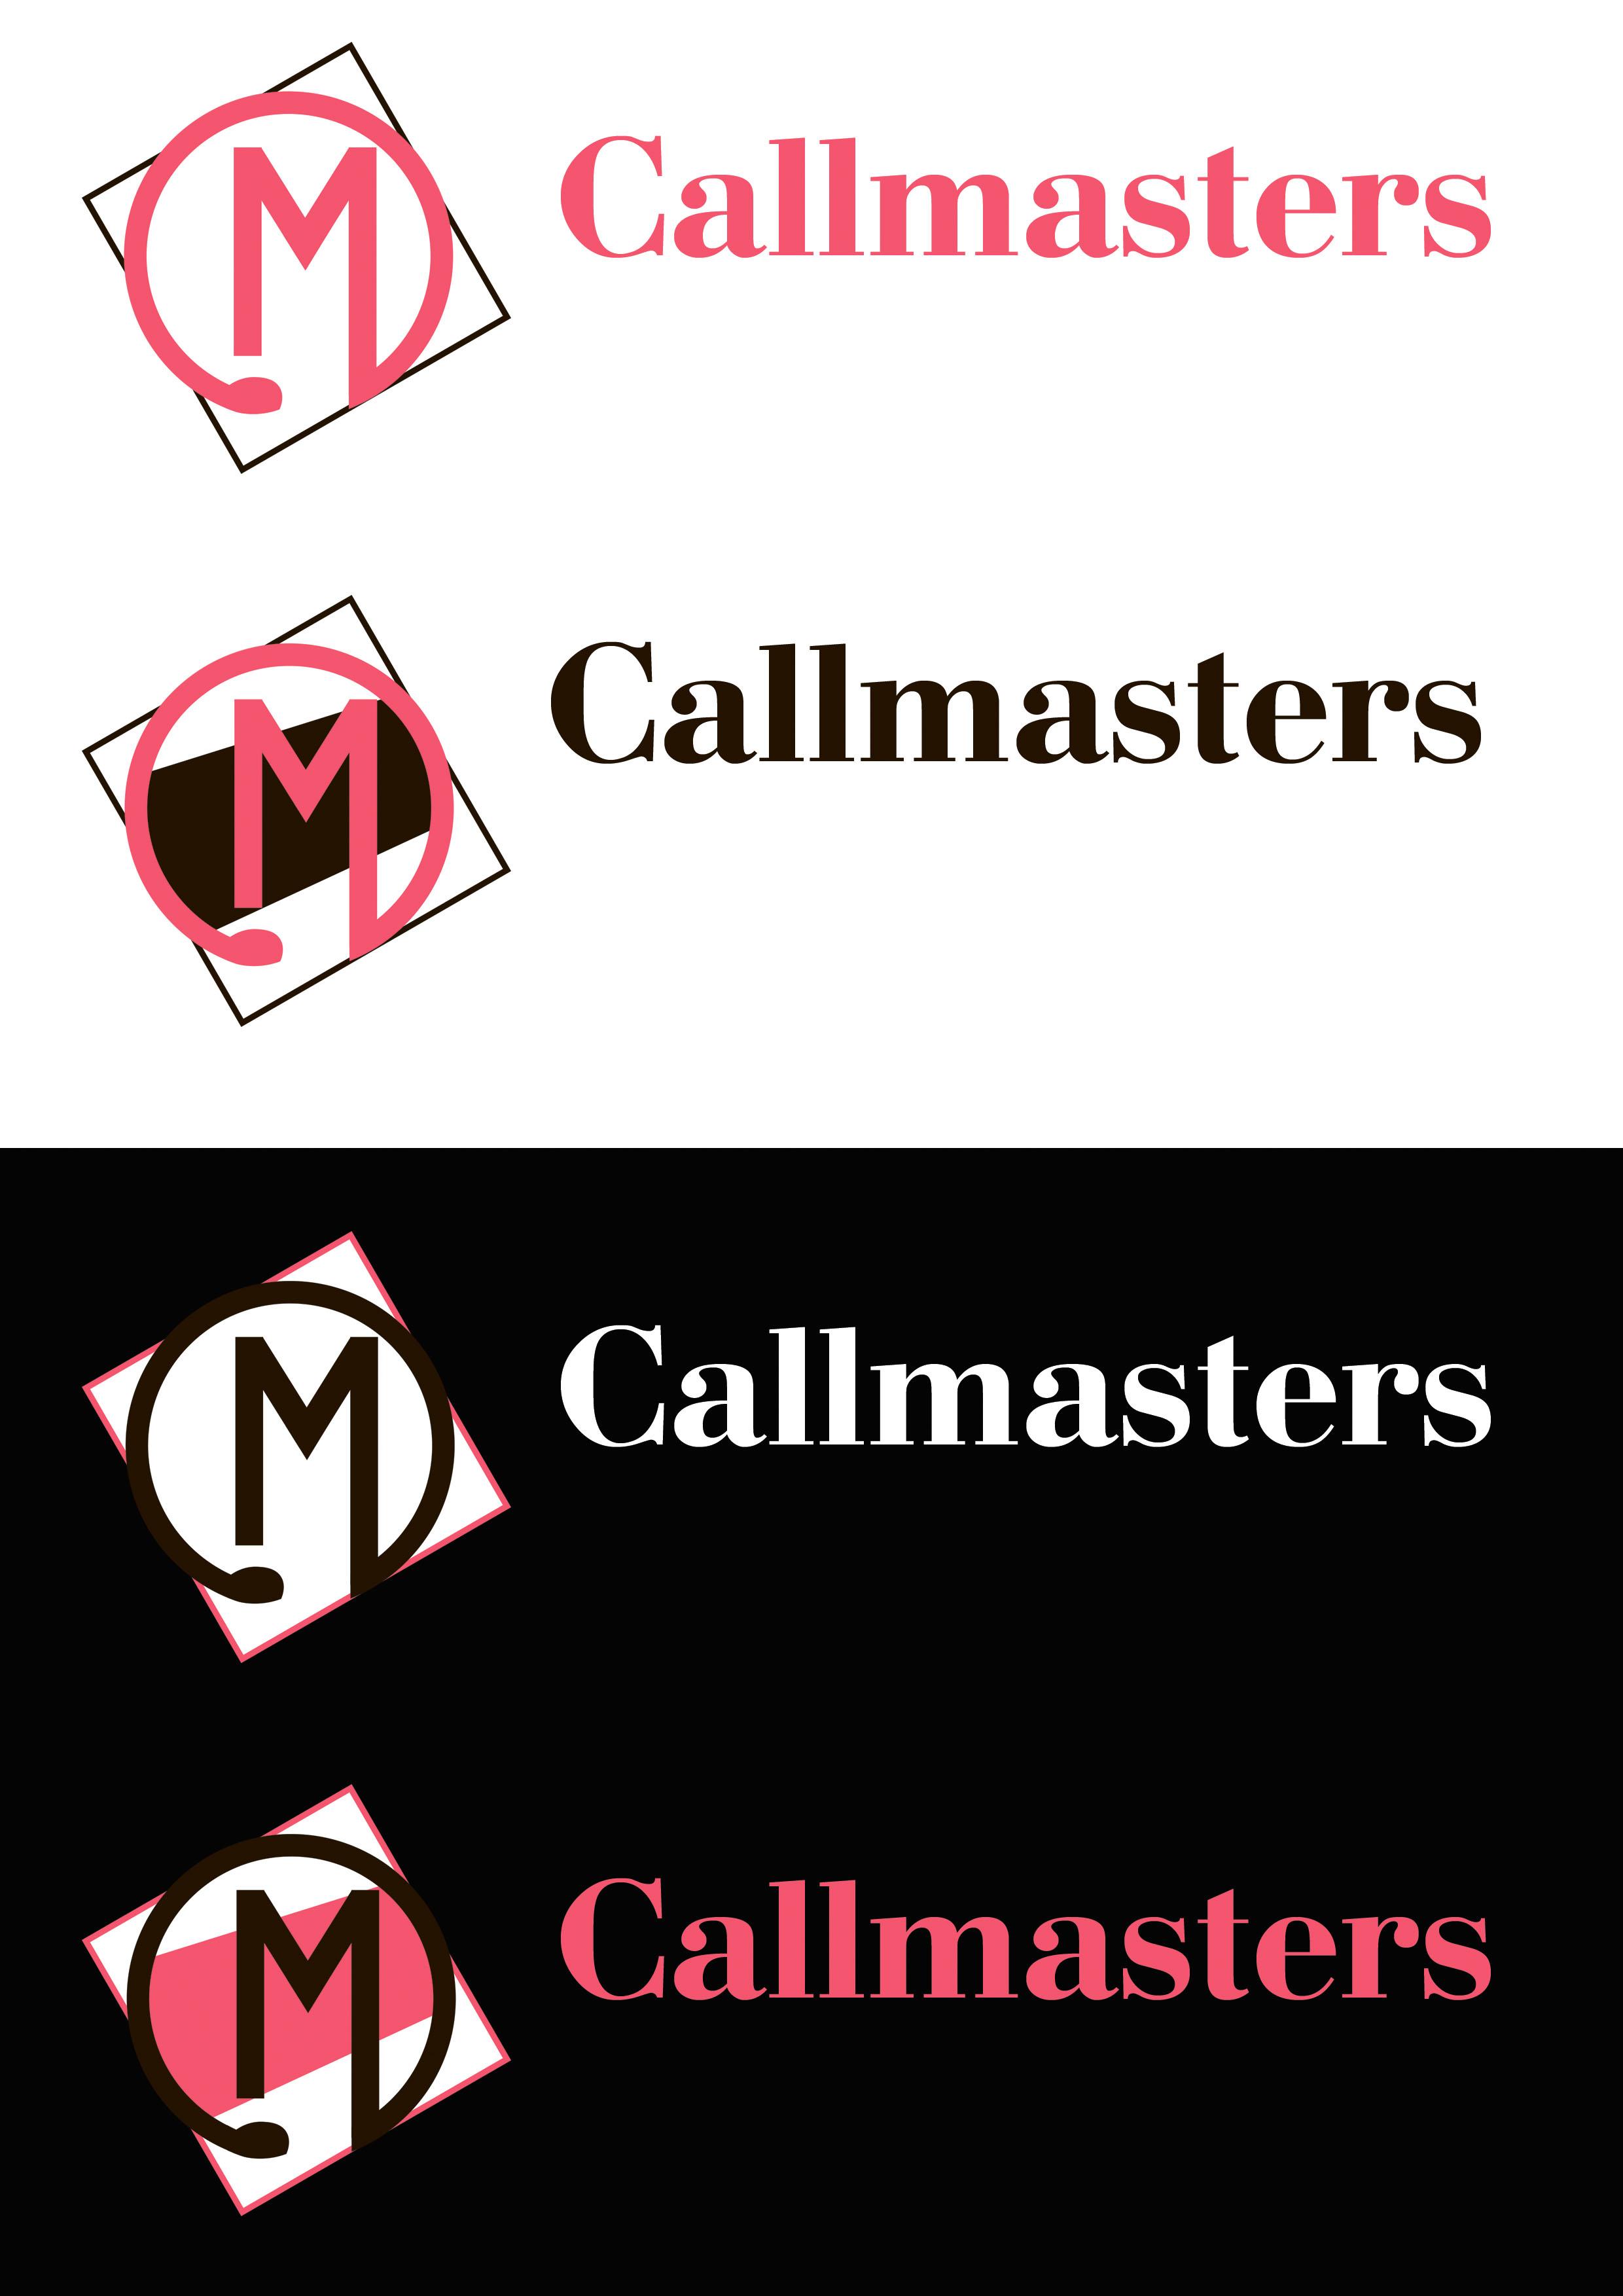 Логотип call-центра Callmasters  фото f_8375b75b00ec303f.jpg